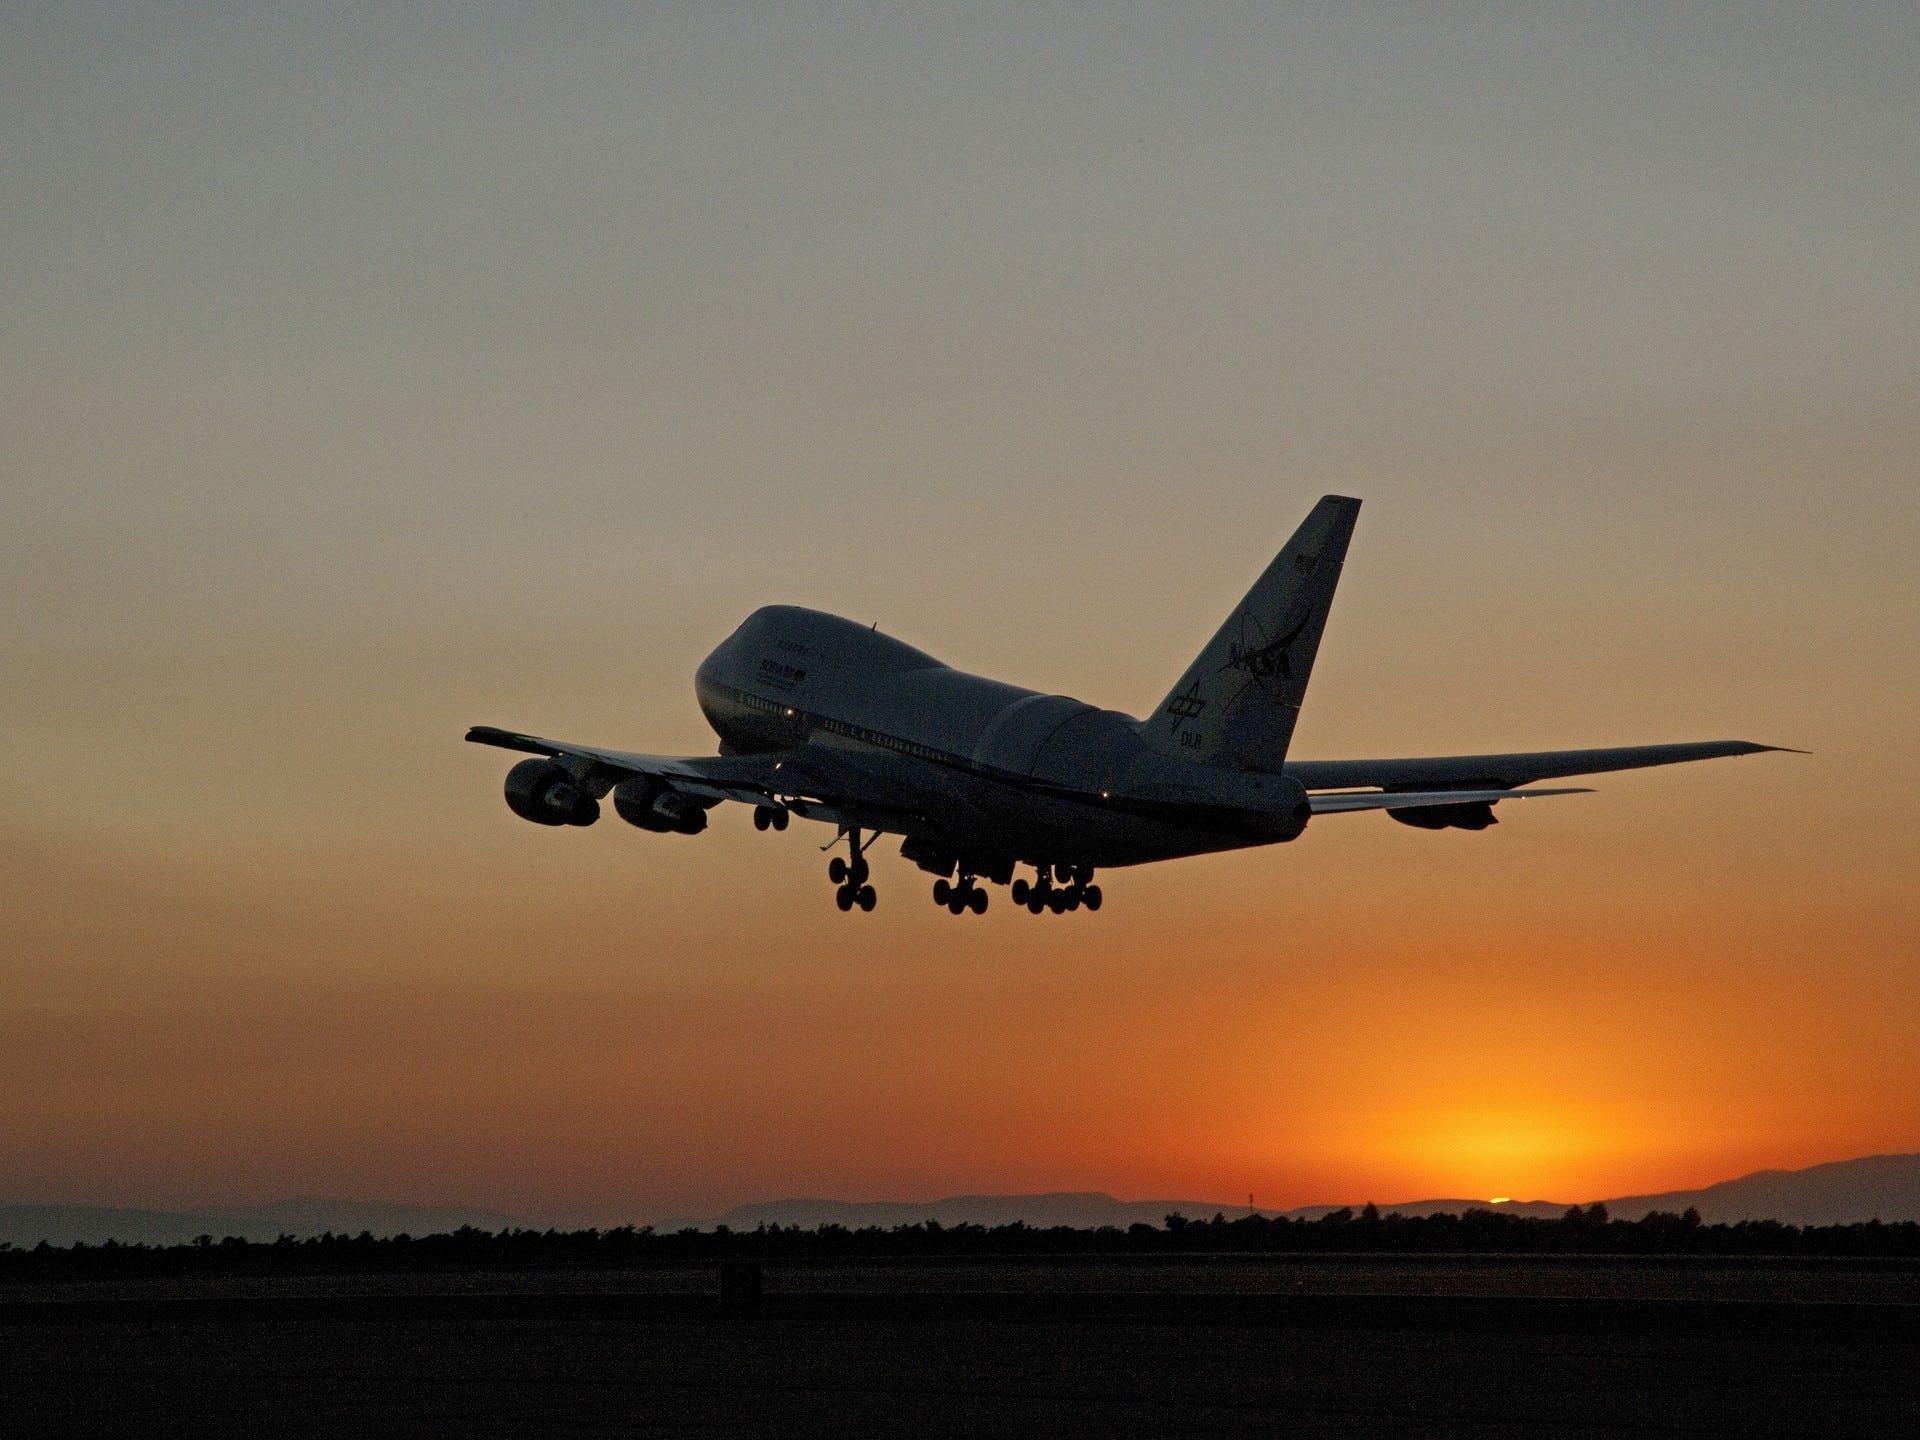 Free stock photo of flight, sky, sunset, flying